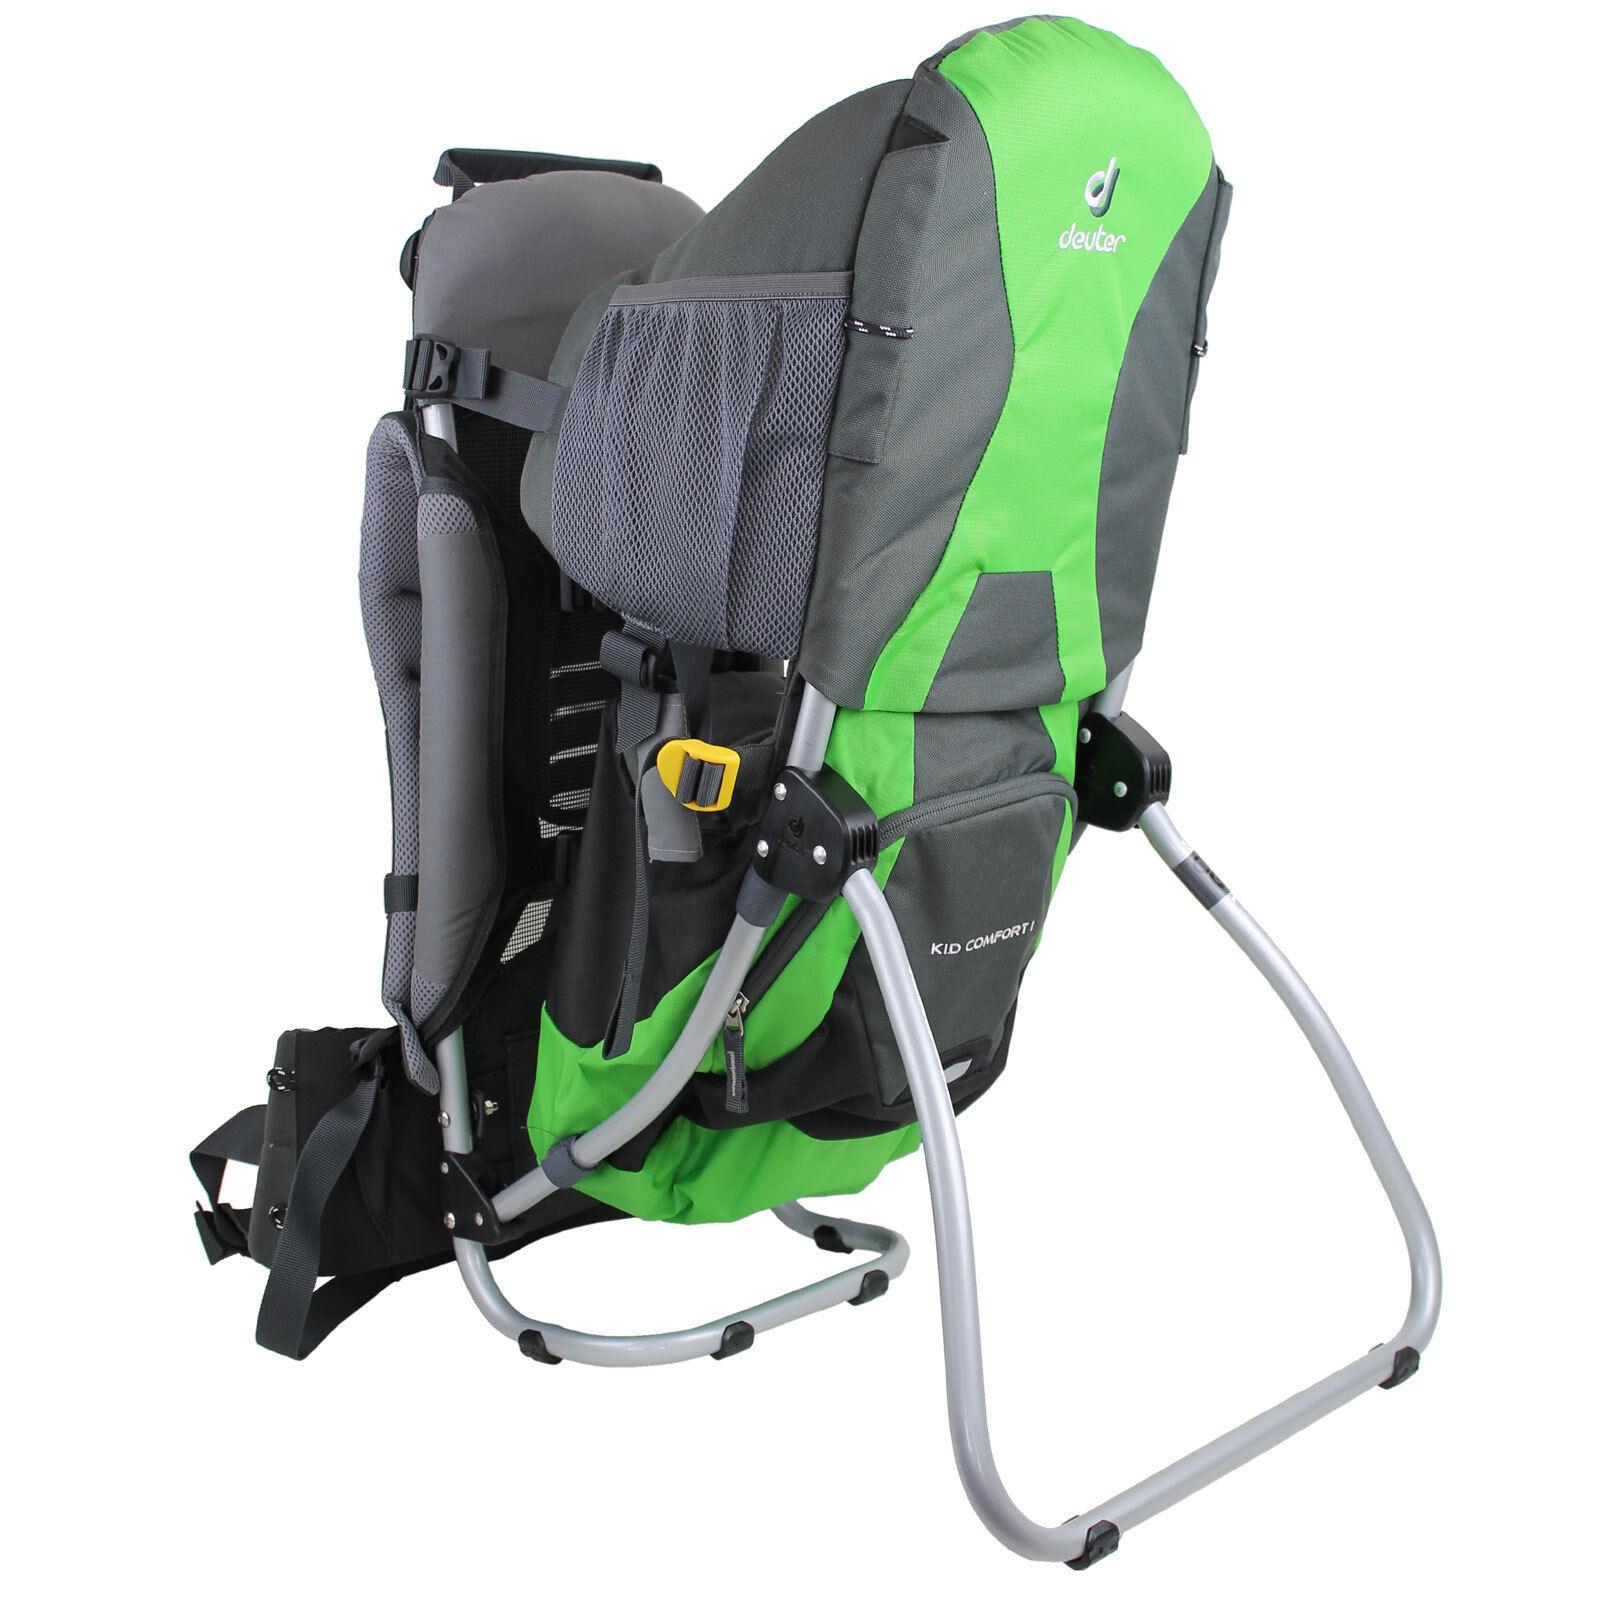 Deuter Kid fort 1 2 3 Child Carrier Backpack Children s Frame